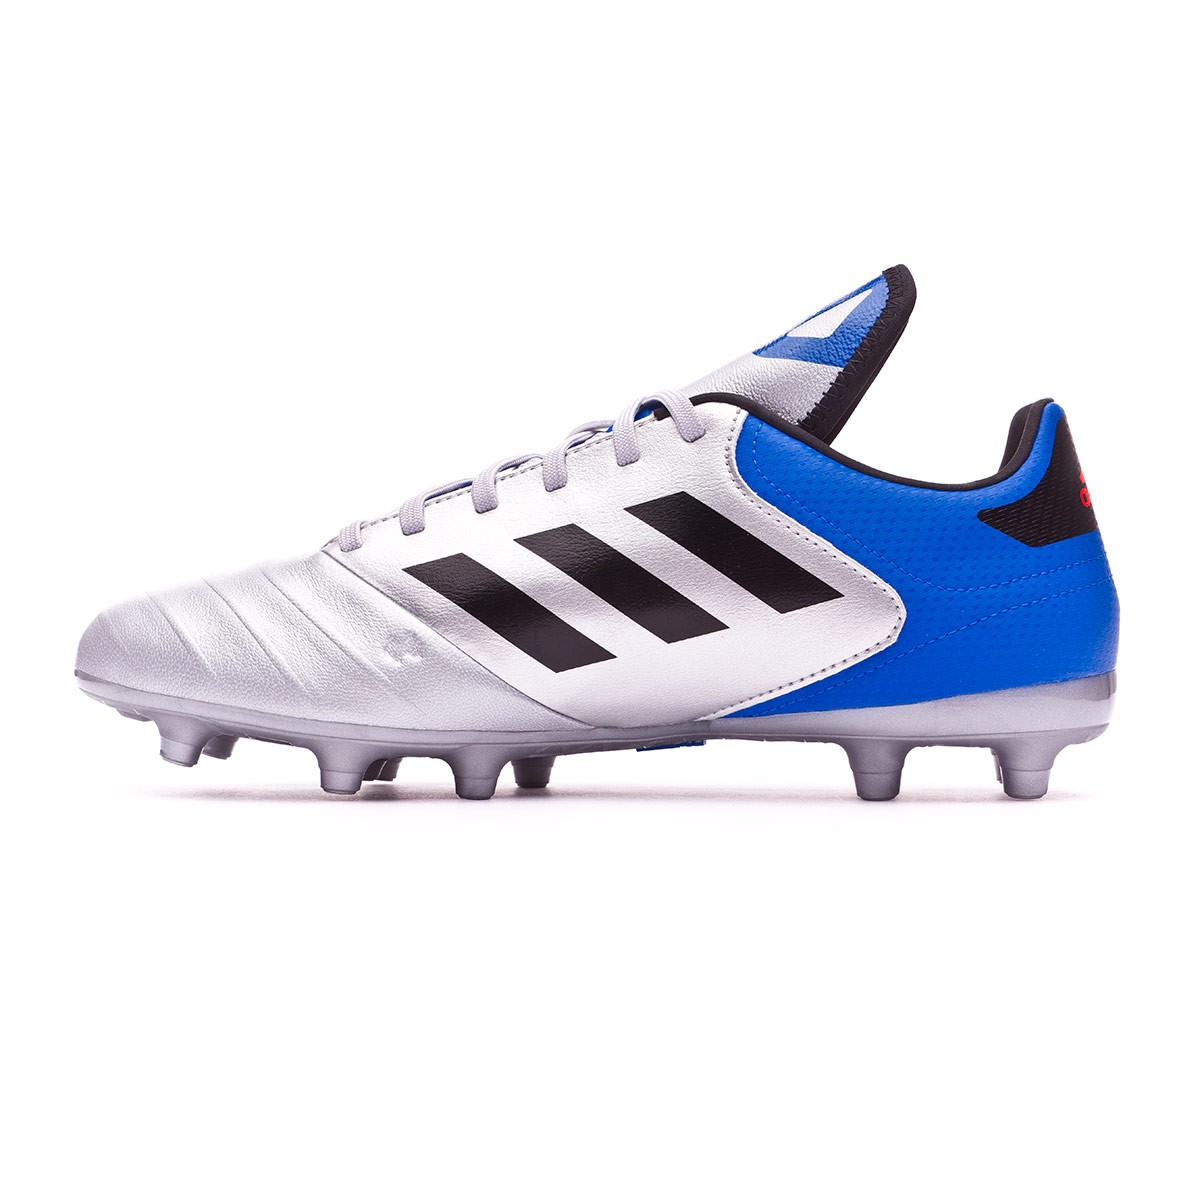 new product 4018f a1720 Boot adidas Copa 18.3 FG Silver metallic-Core black-Football blue - Football  store Fútbol Emotion